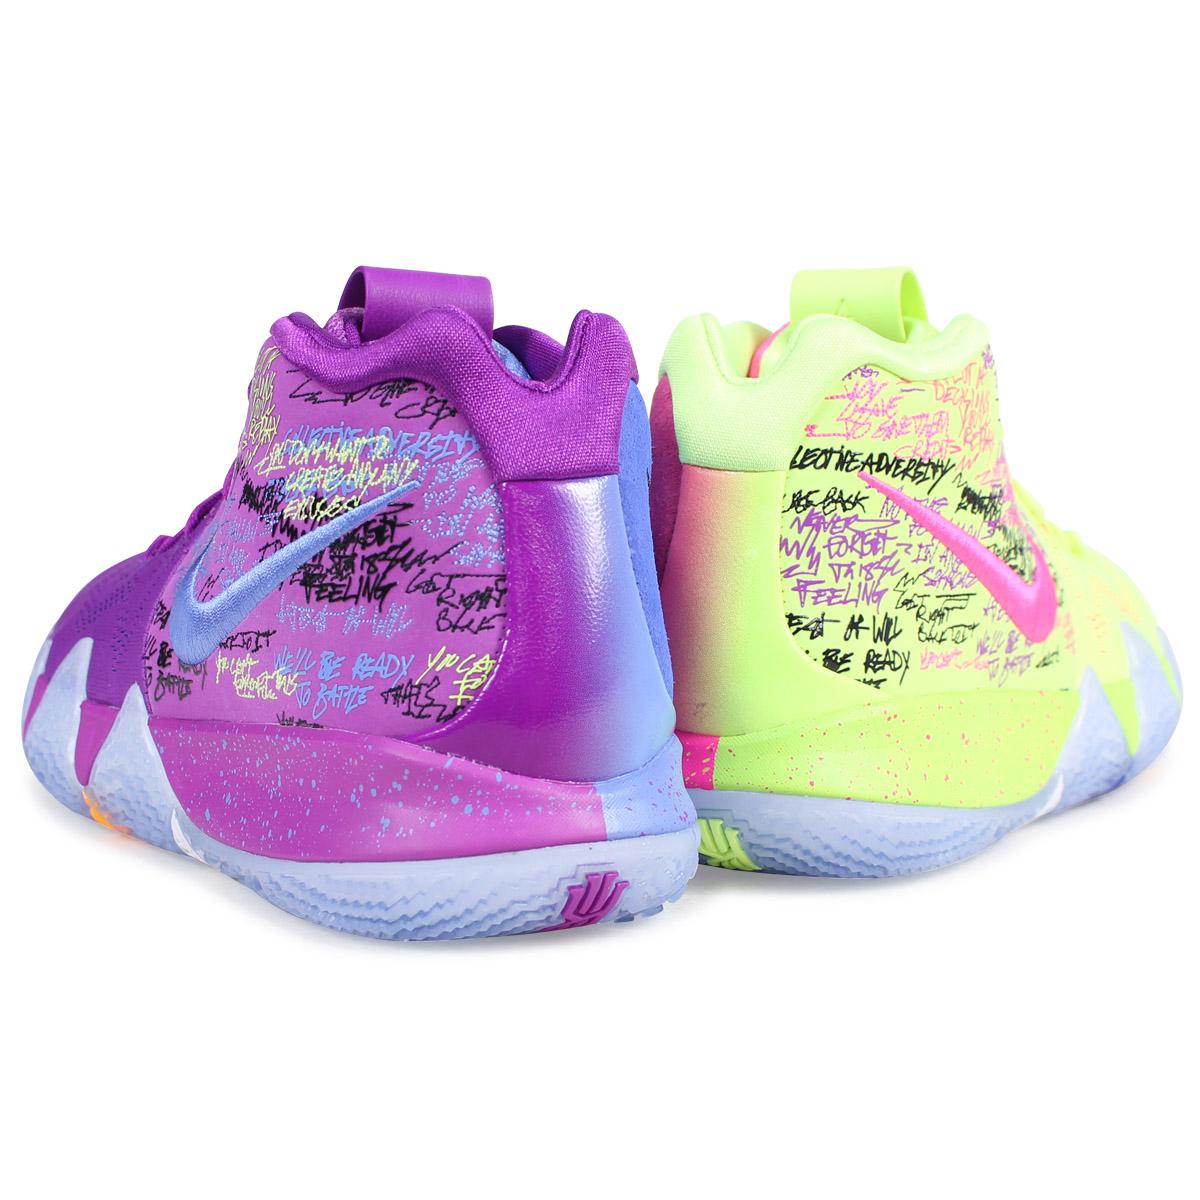 sports shoes 09c85 a05b5 NIKE KYRIE 4 EP CONFETTI Nike chi Lee 4 sneakers men AJ1691-900 カイリーアービングマルチ